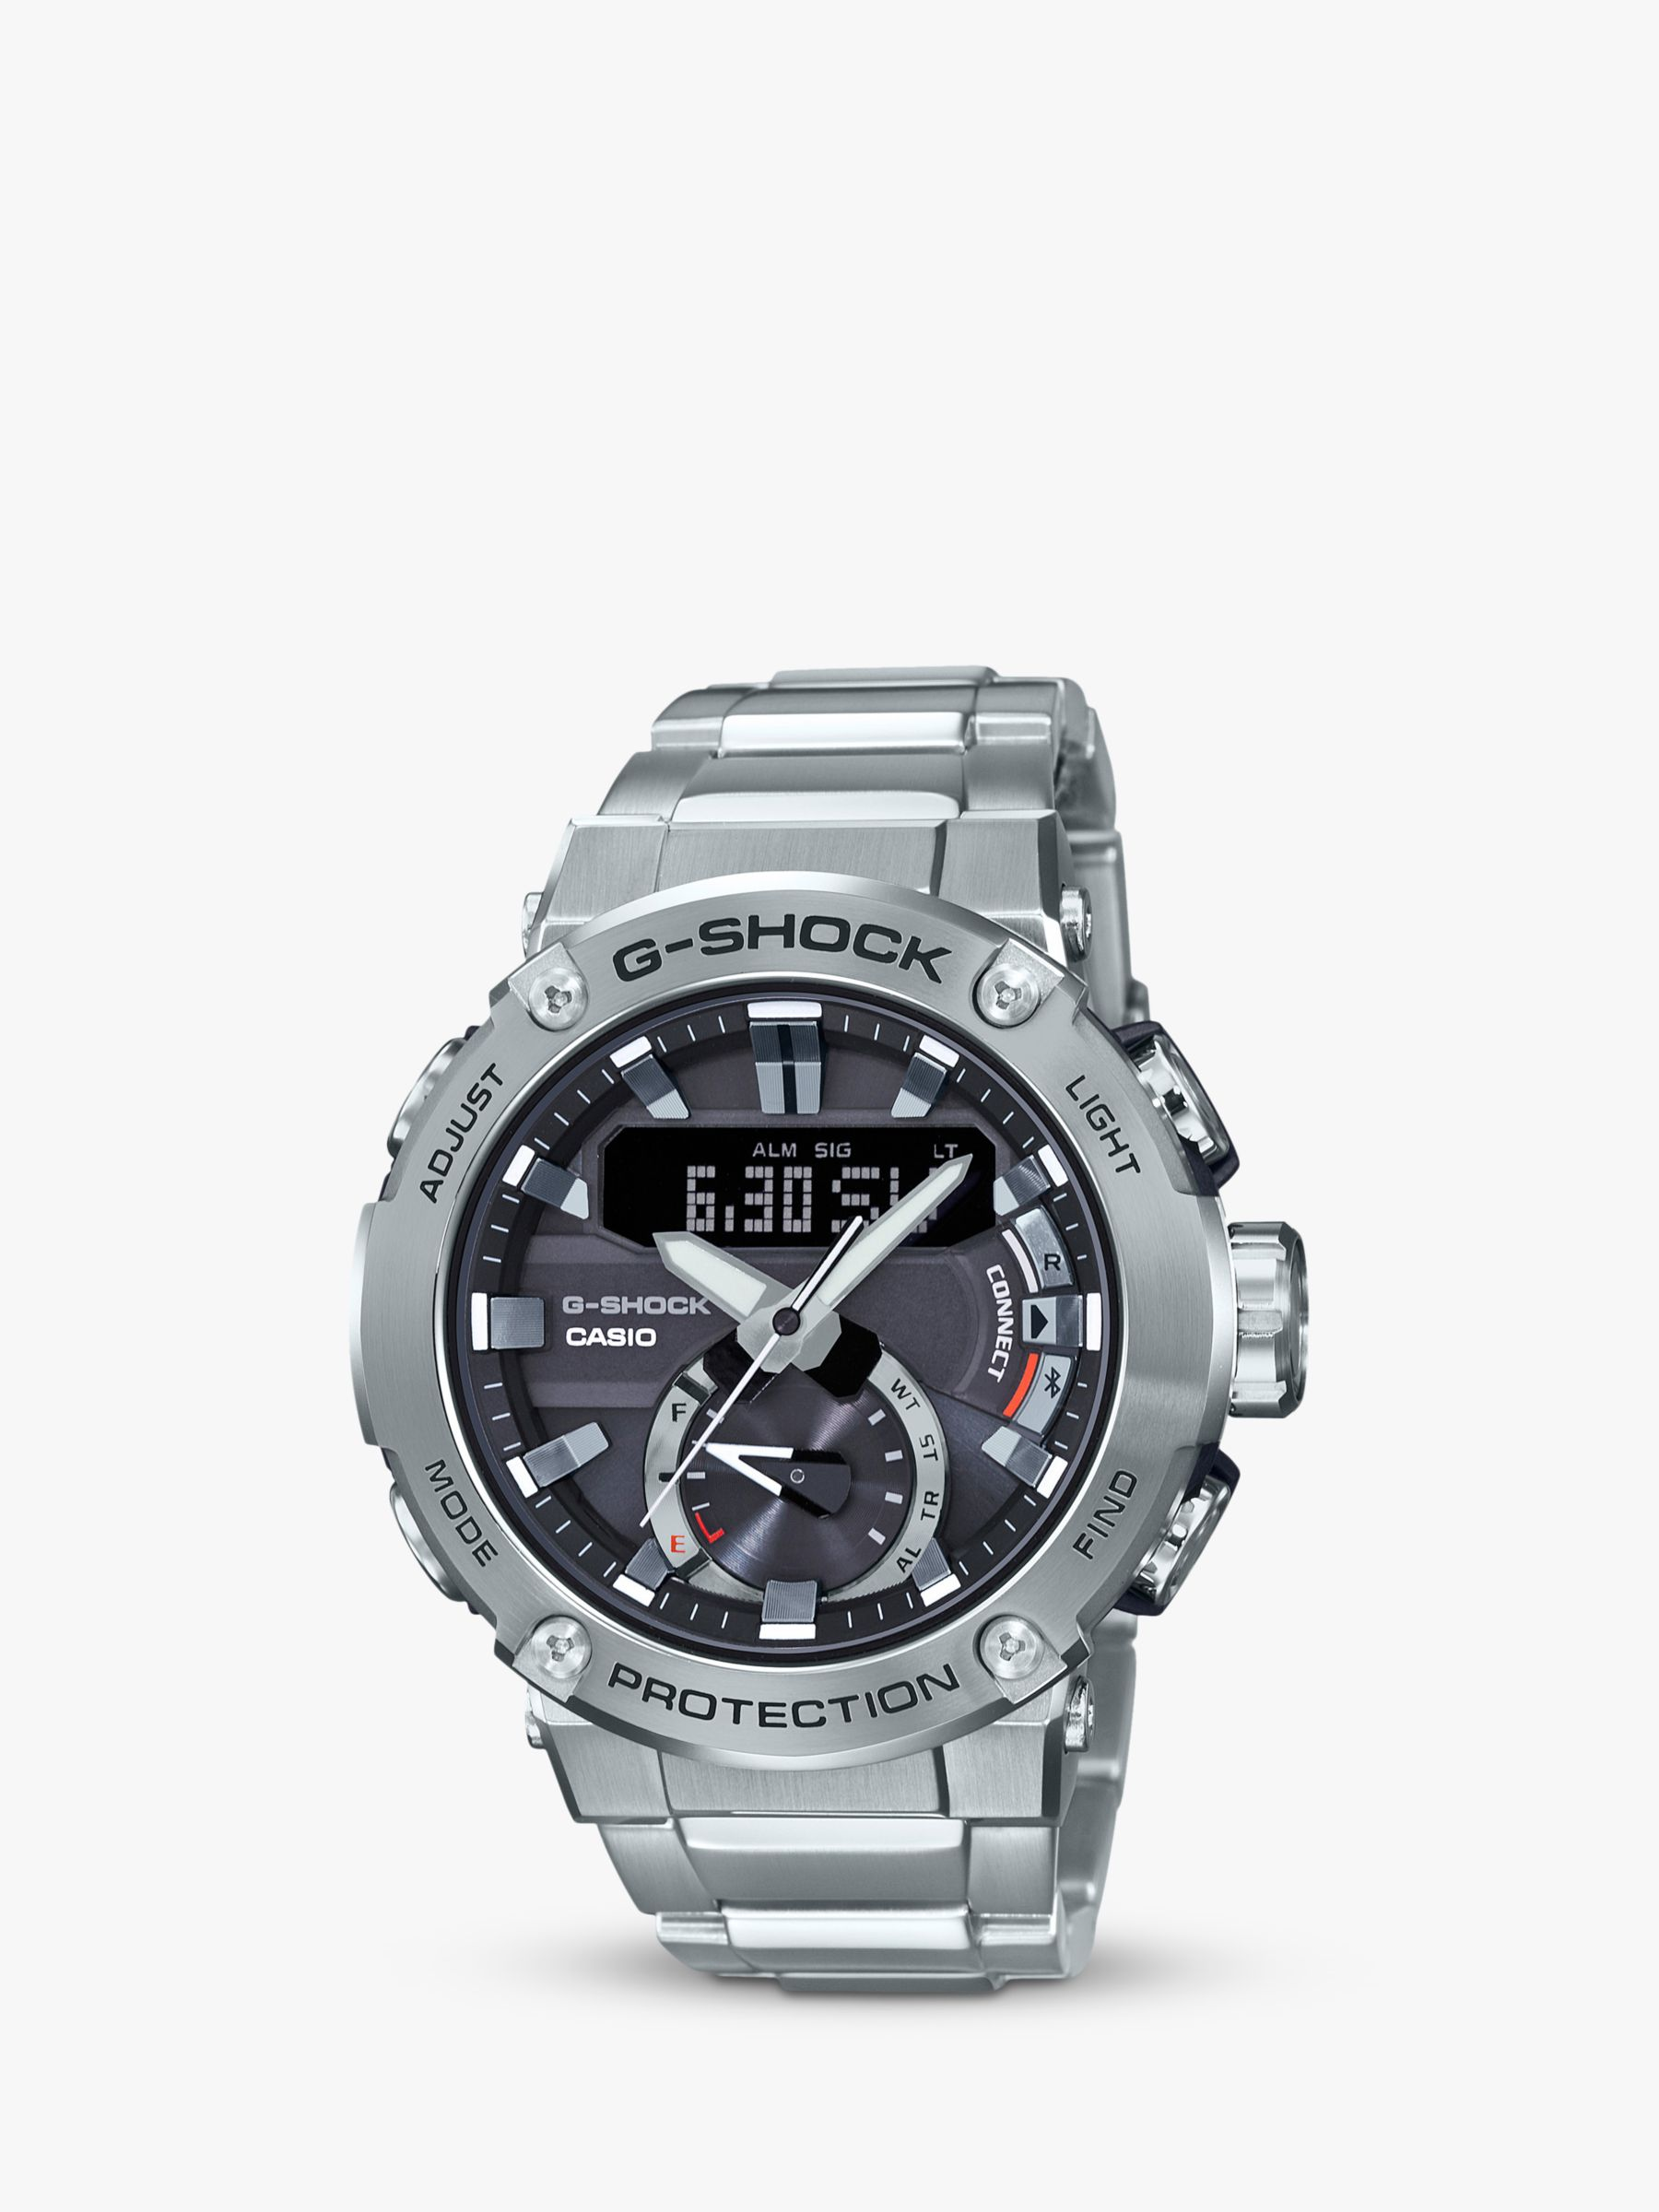 Casio Casio GST-B200D-1AER Men's G-Shock Bluetooth Bracelet Strap Watch, Silver/Black